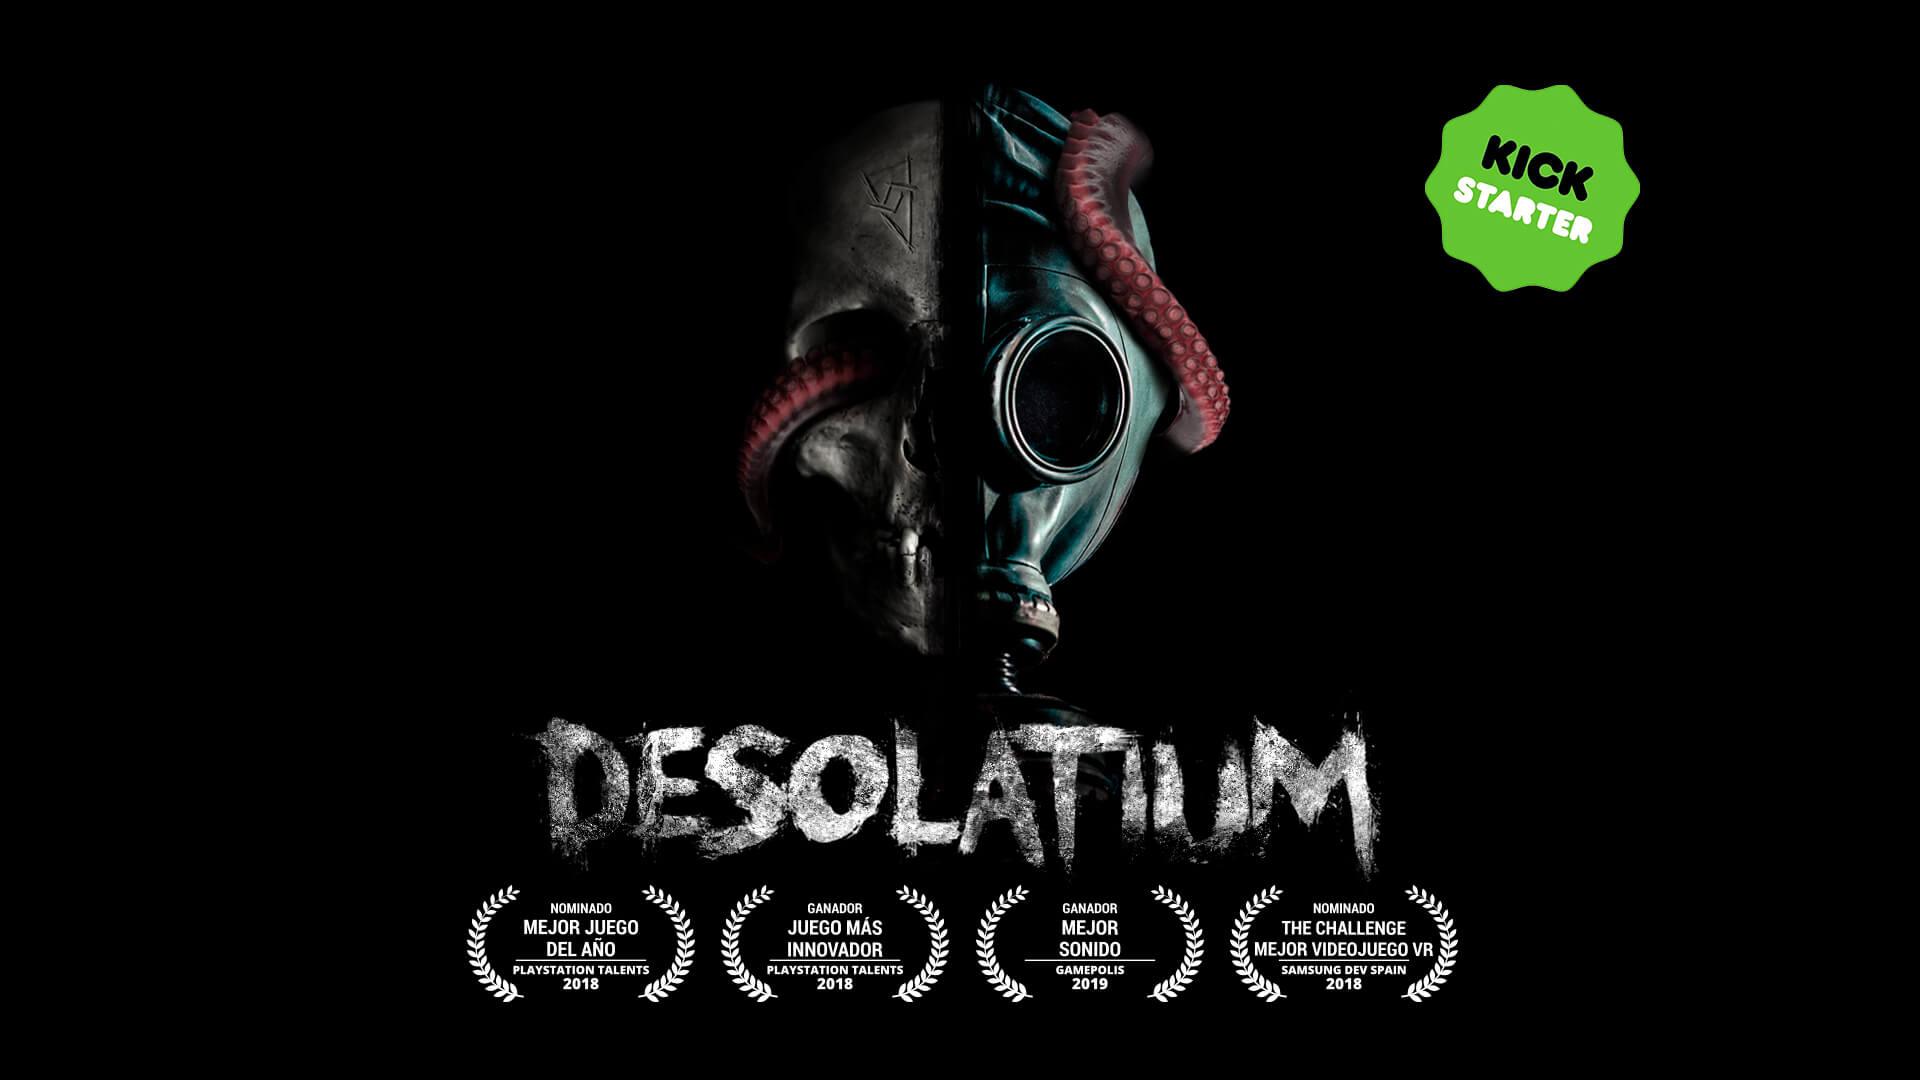 Desolatium kickstarter